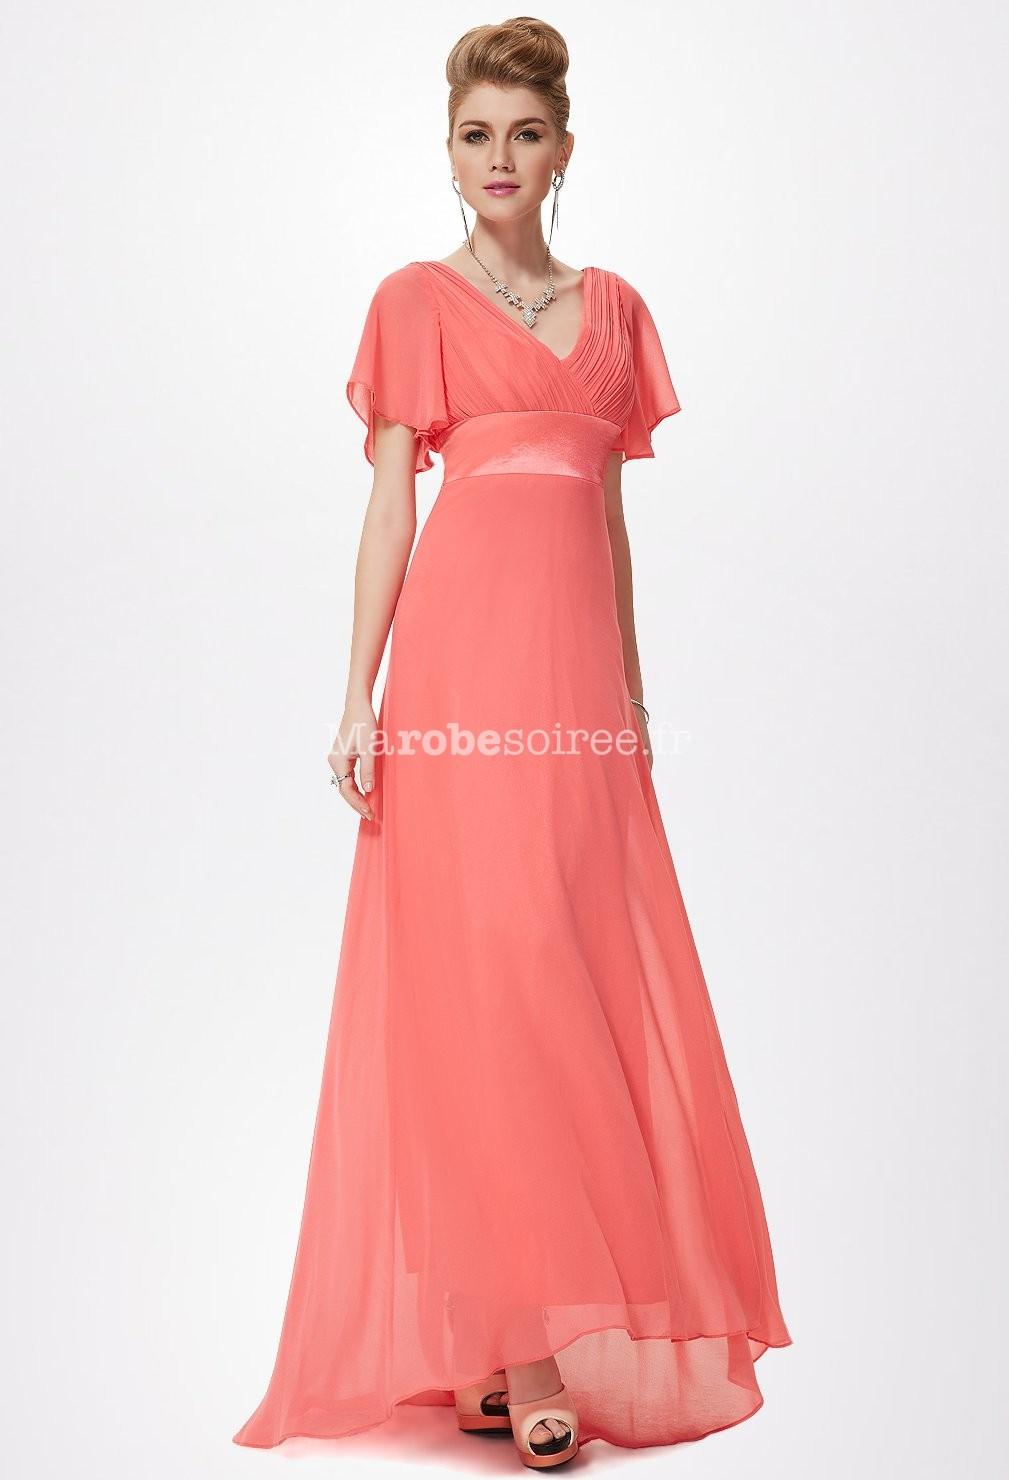 robe de soir e glamour manches courtes d collet en v. Black Bedroom Furniture Sets. Home Design Ideas